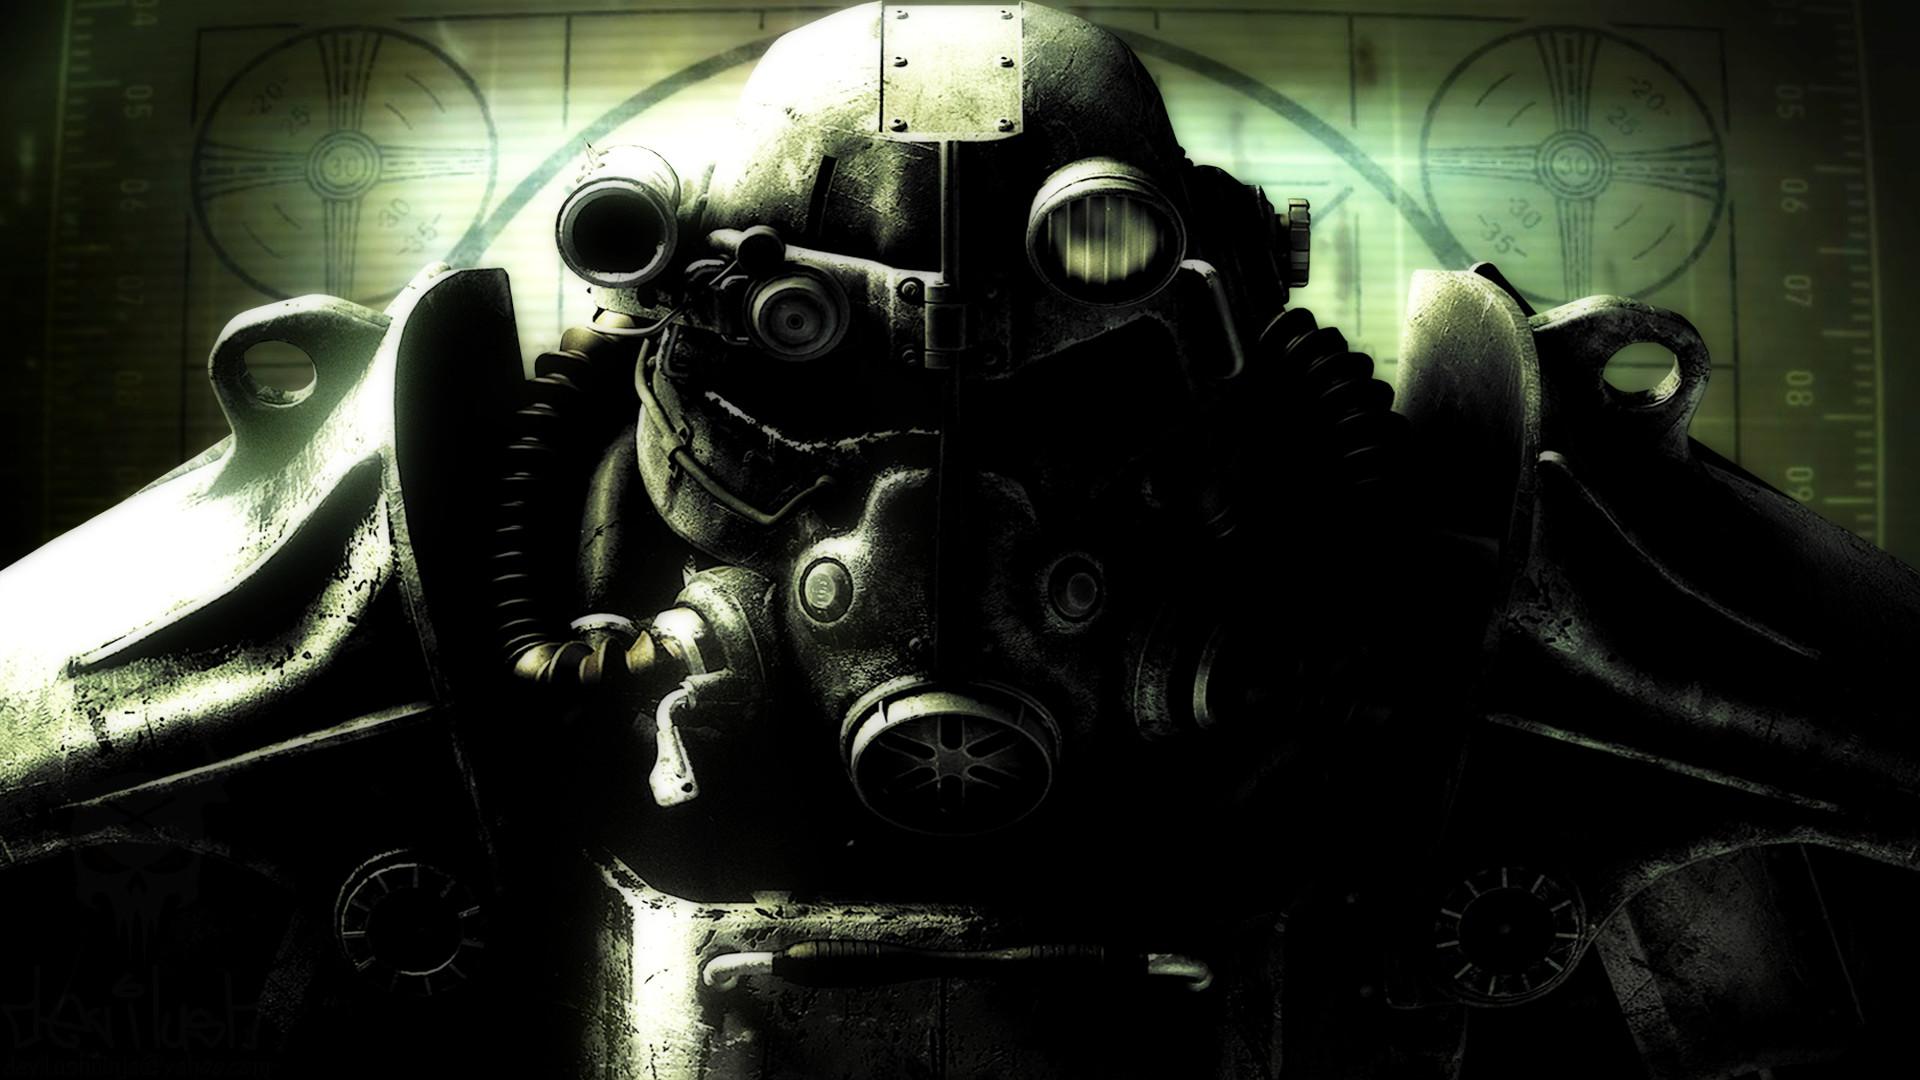 Fallout Brotherhood Wallpaper Fallout, Brotherhood, Of ..